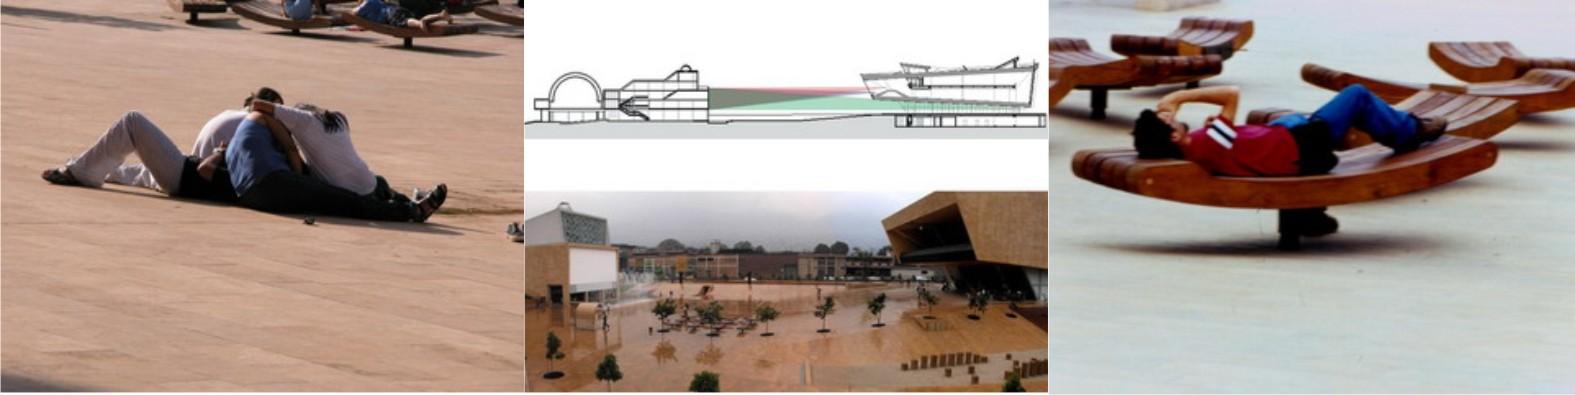 Arquitectura y tecnolog a repocero utdt 2009 for Equipamiento urbano arquitectura pdf